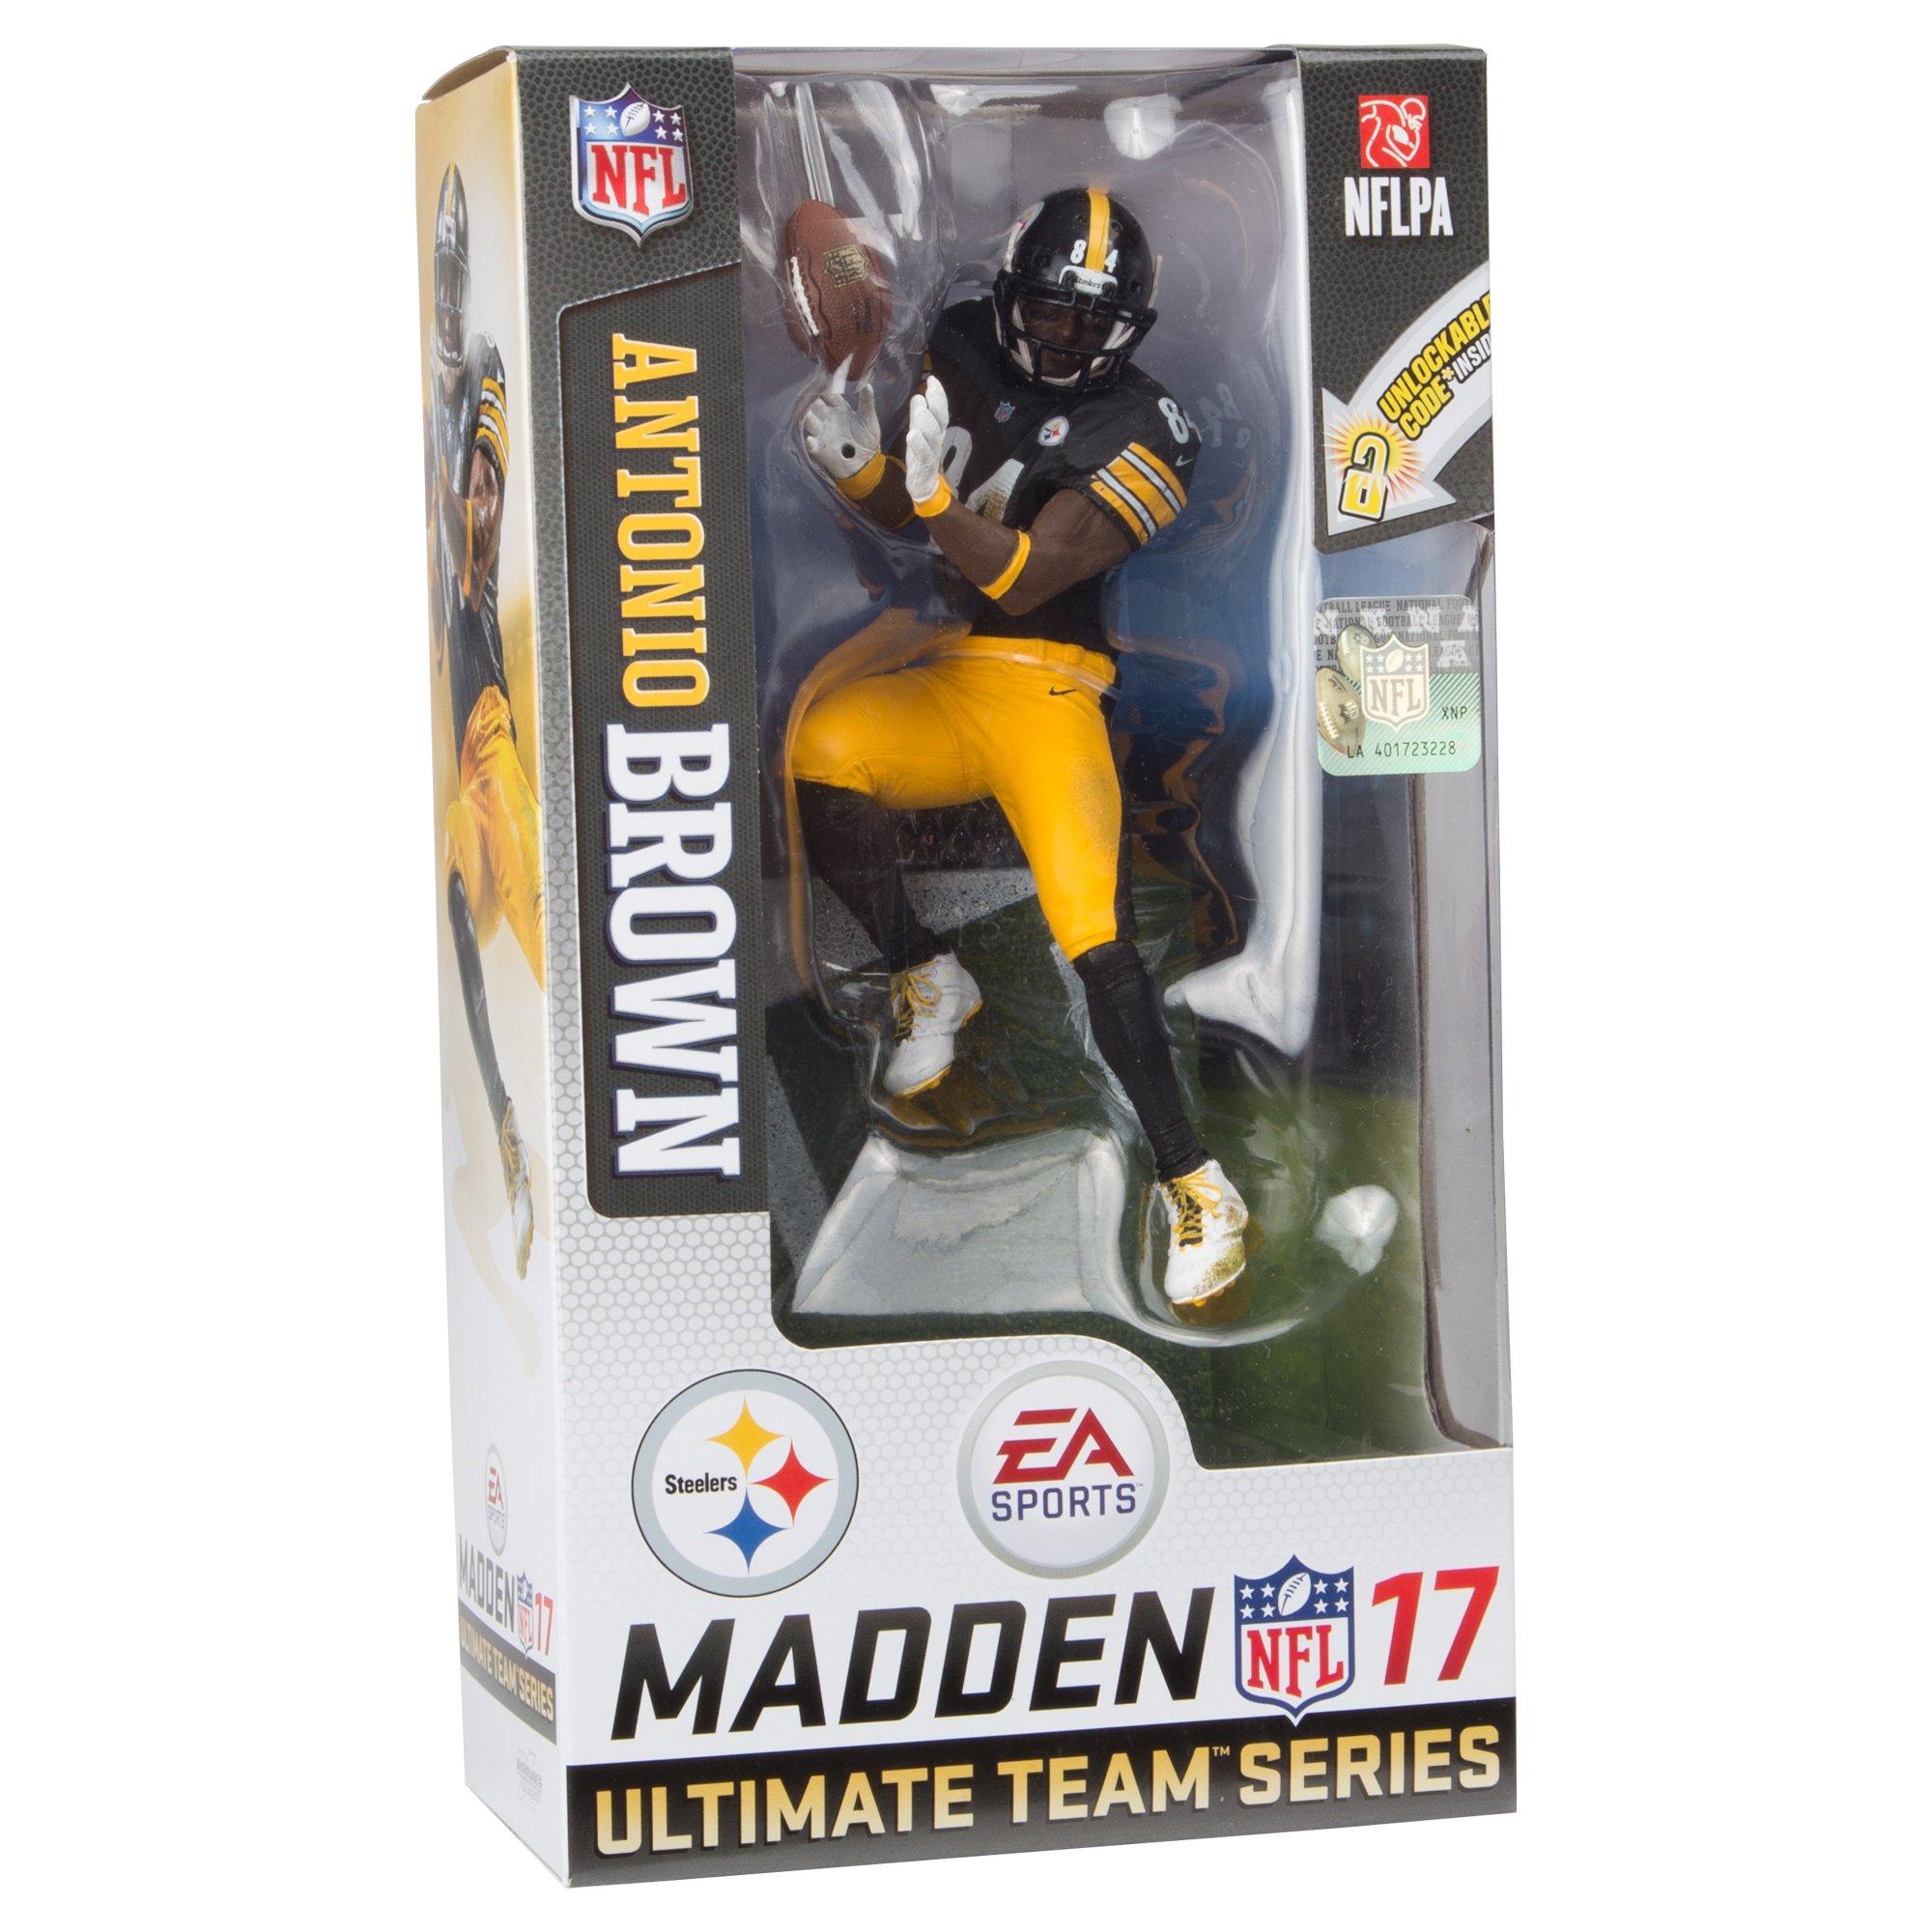 McFarlane Toys EA Sports Madden NFL 17 Ultimate Team Series 3 Figura de Antonio Brown